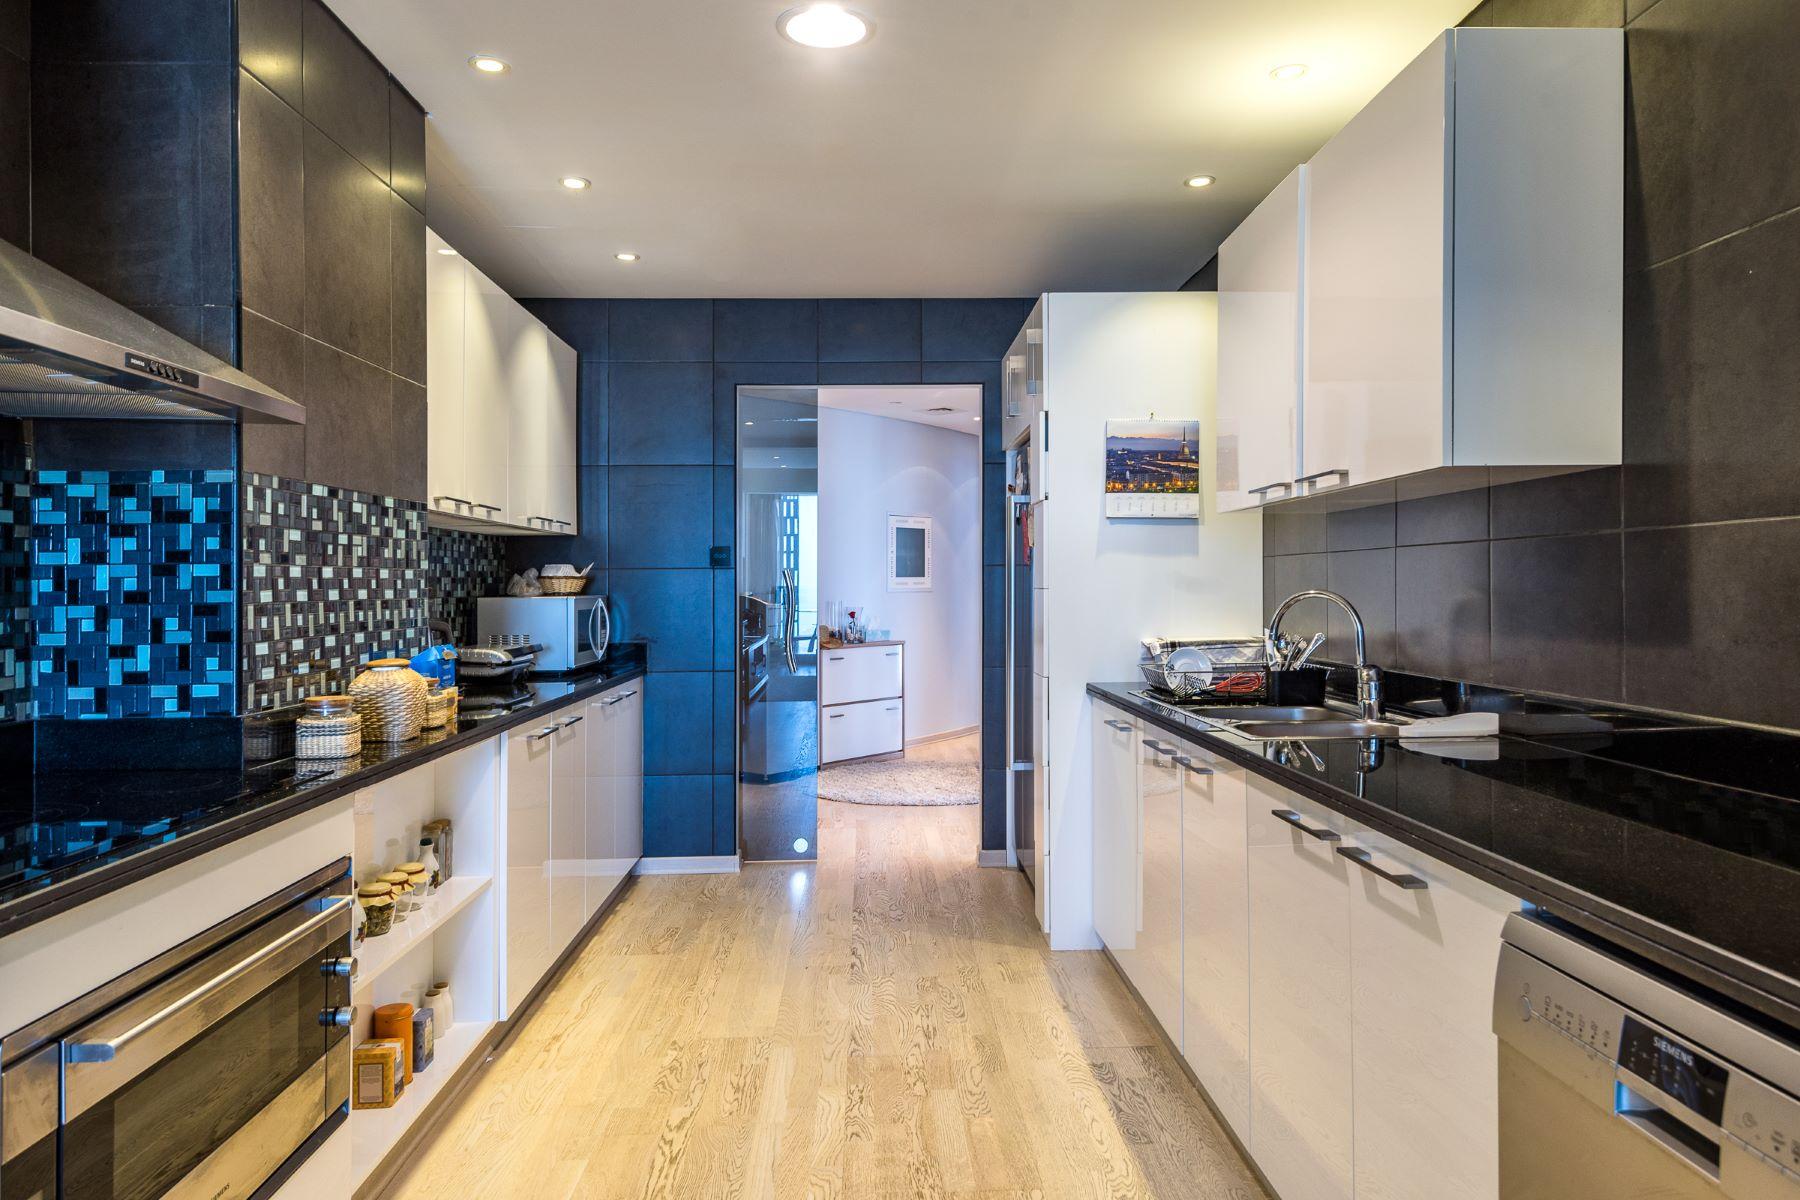 Apartment for Sale at Cayan Tower Apartment Dubai, Dubai United Arab Emirates